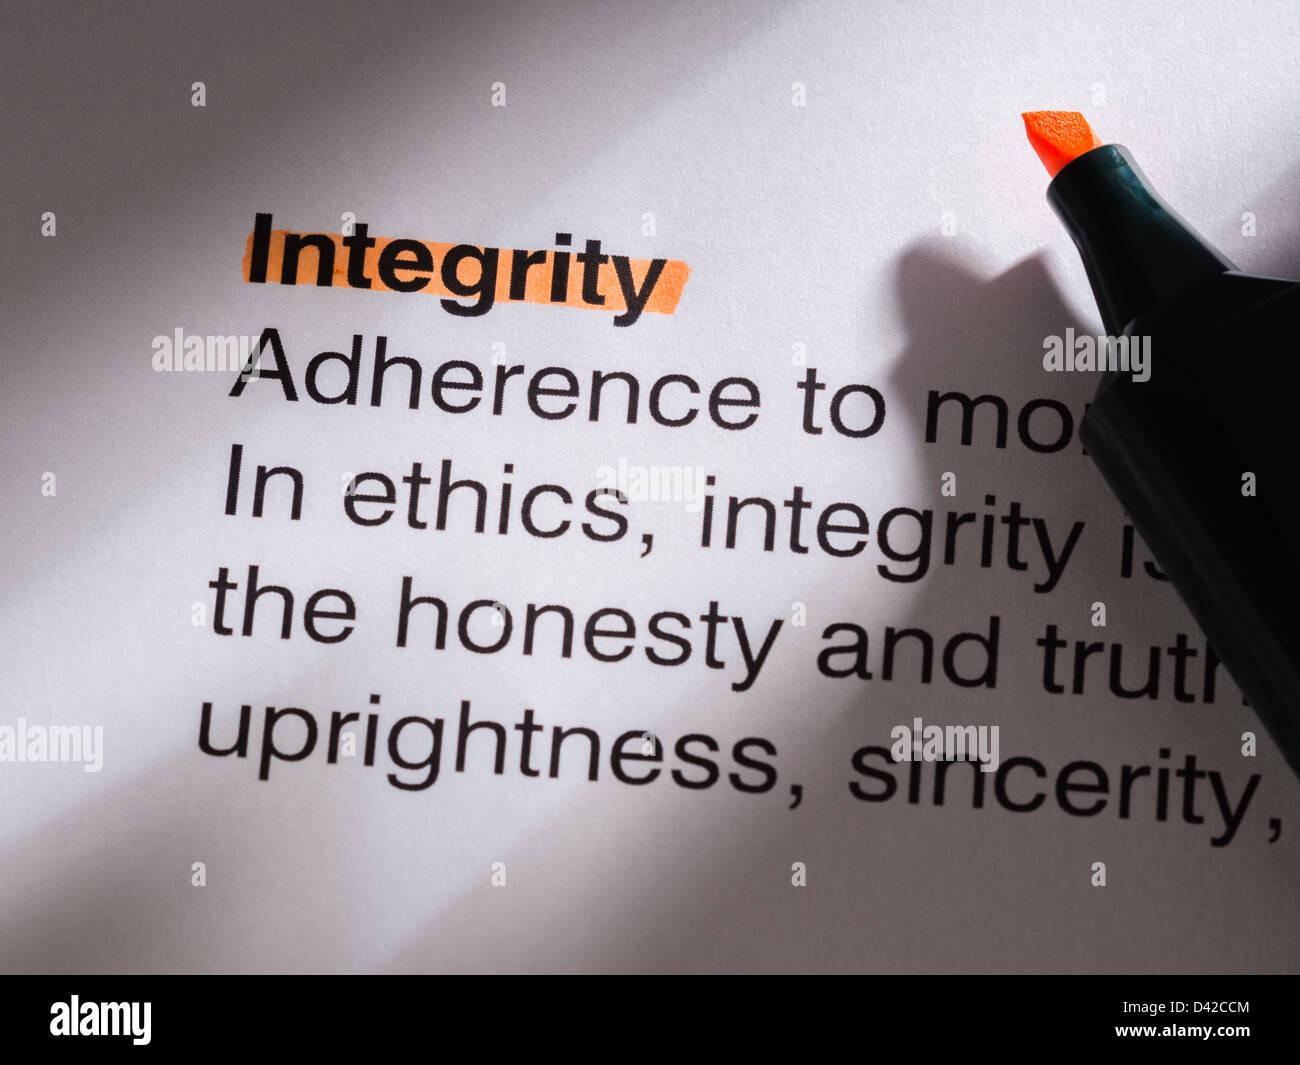 integrity - Stock Image